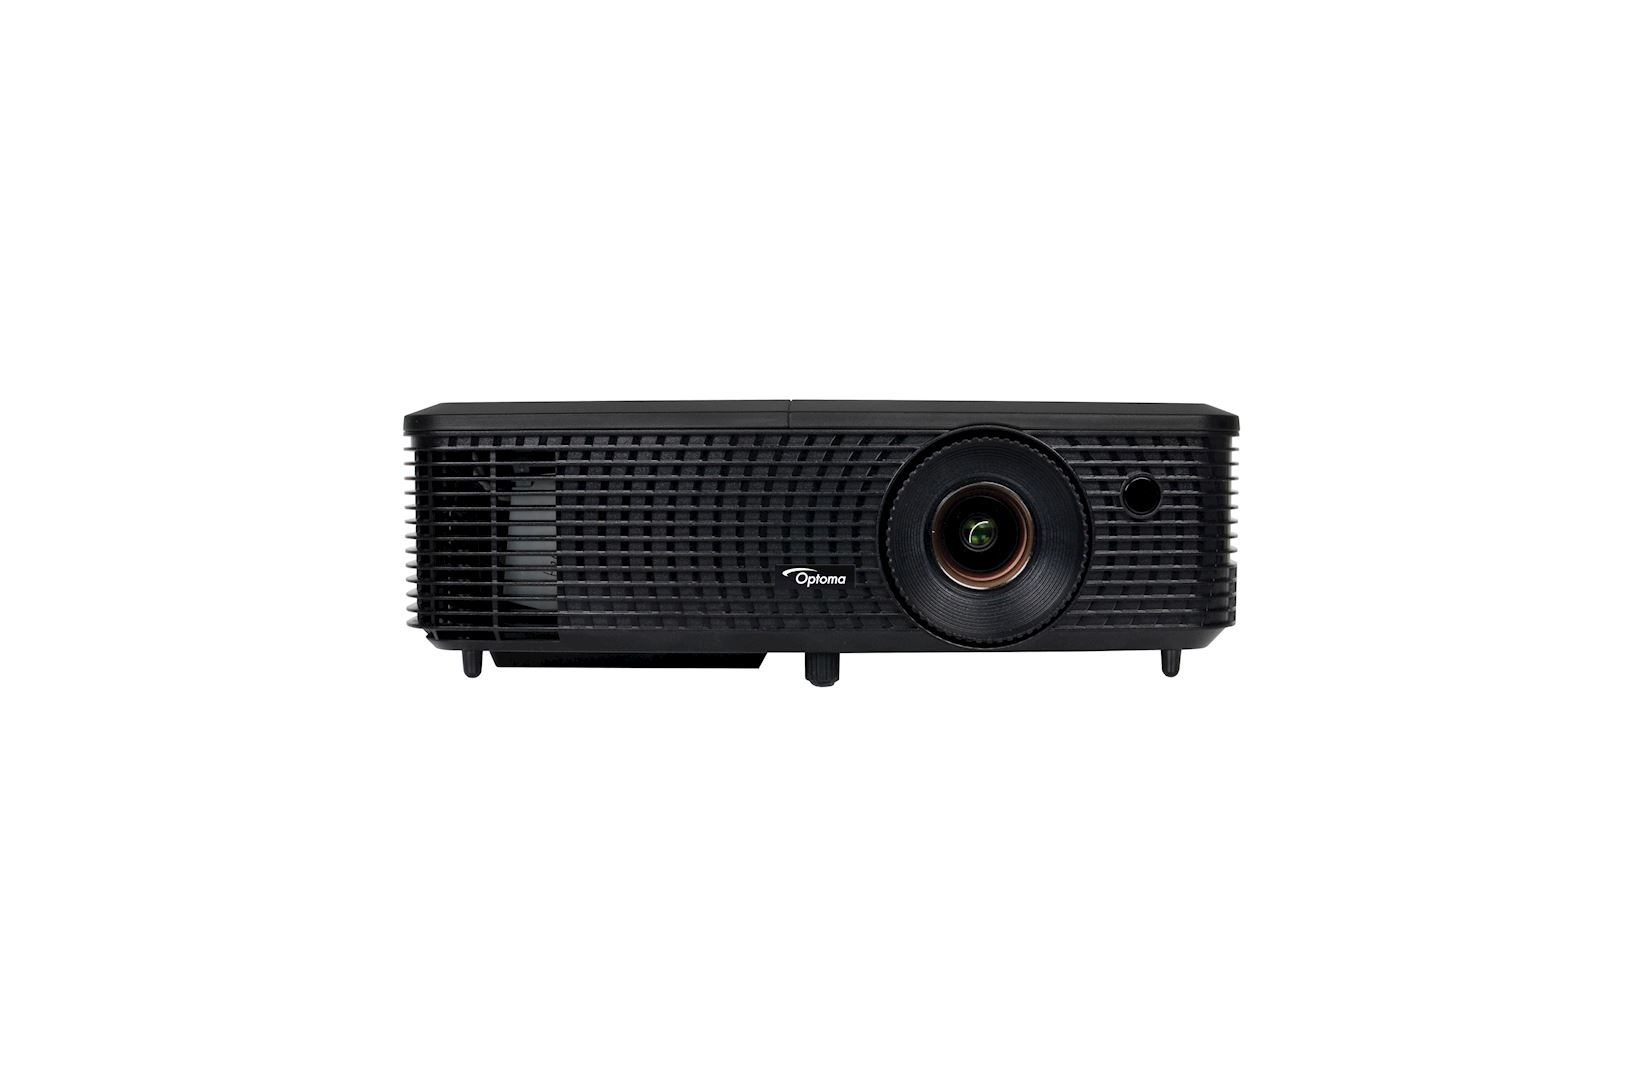 Videoproiector Optoma DX349 XGA